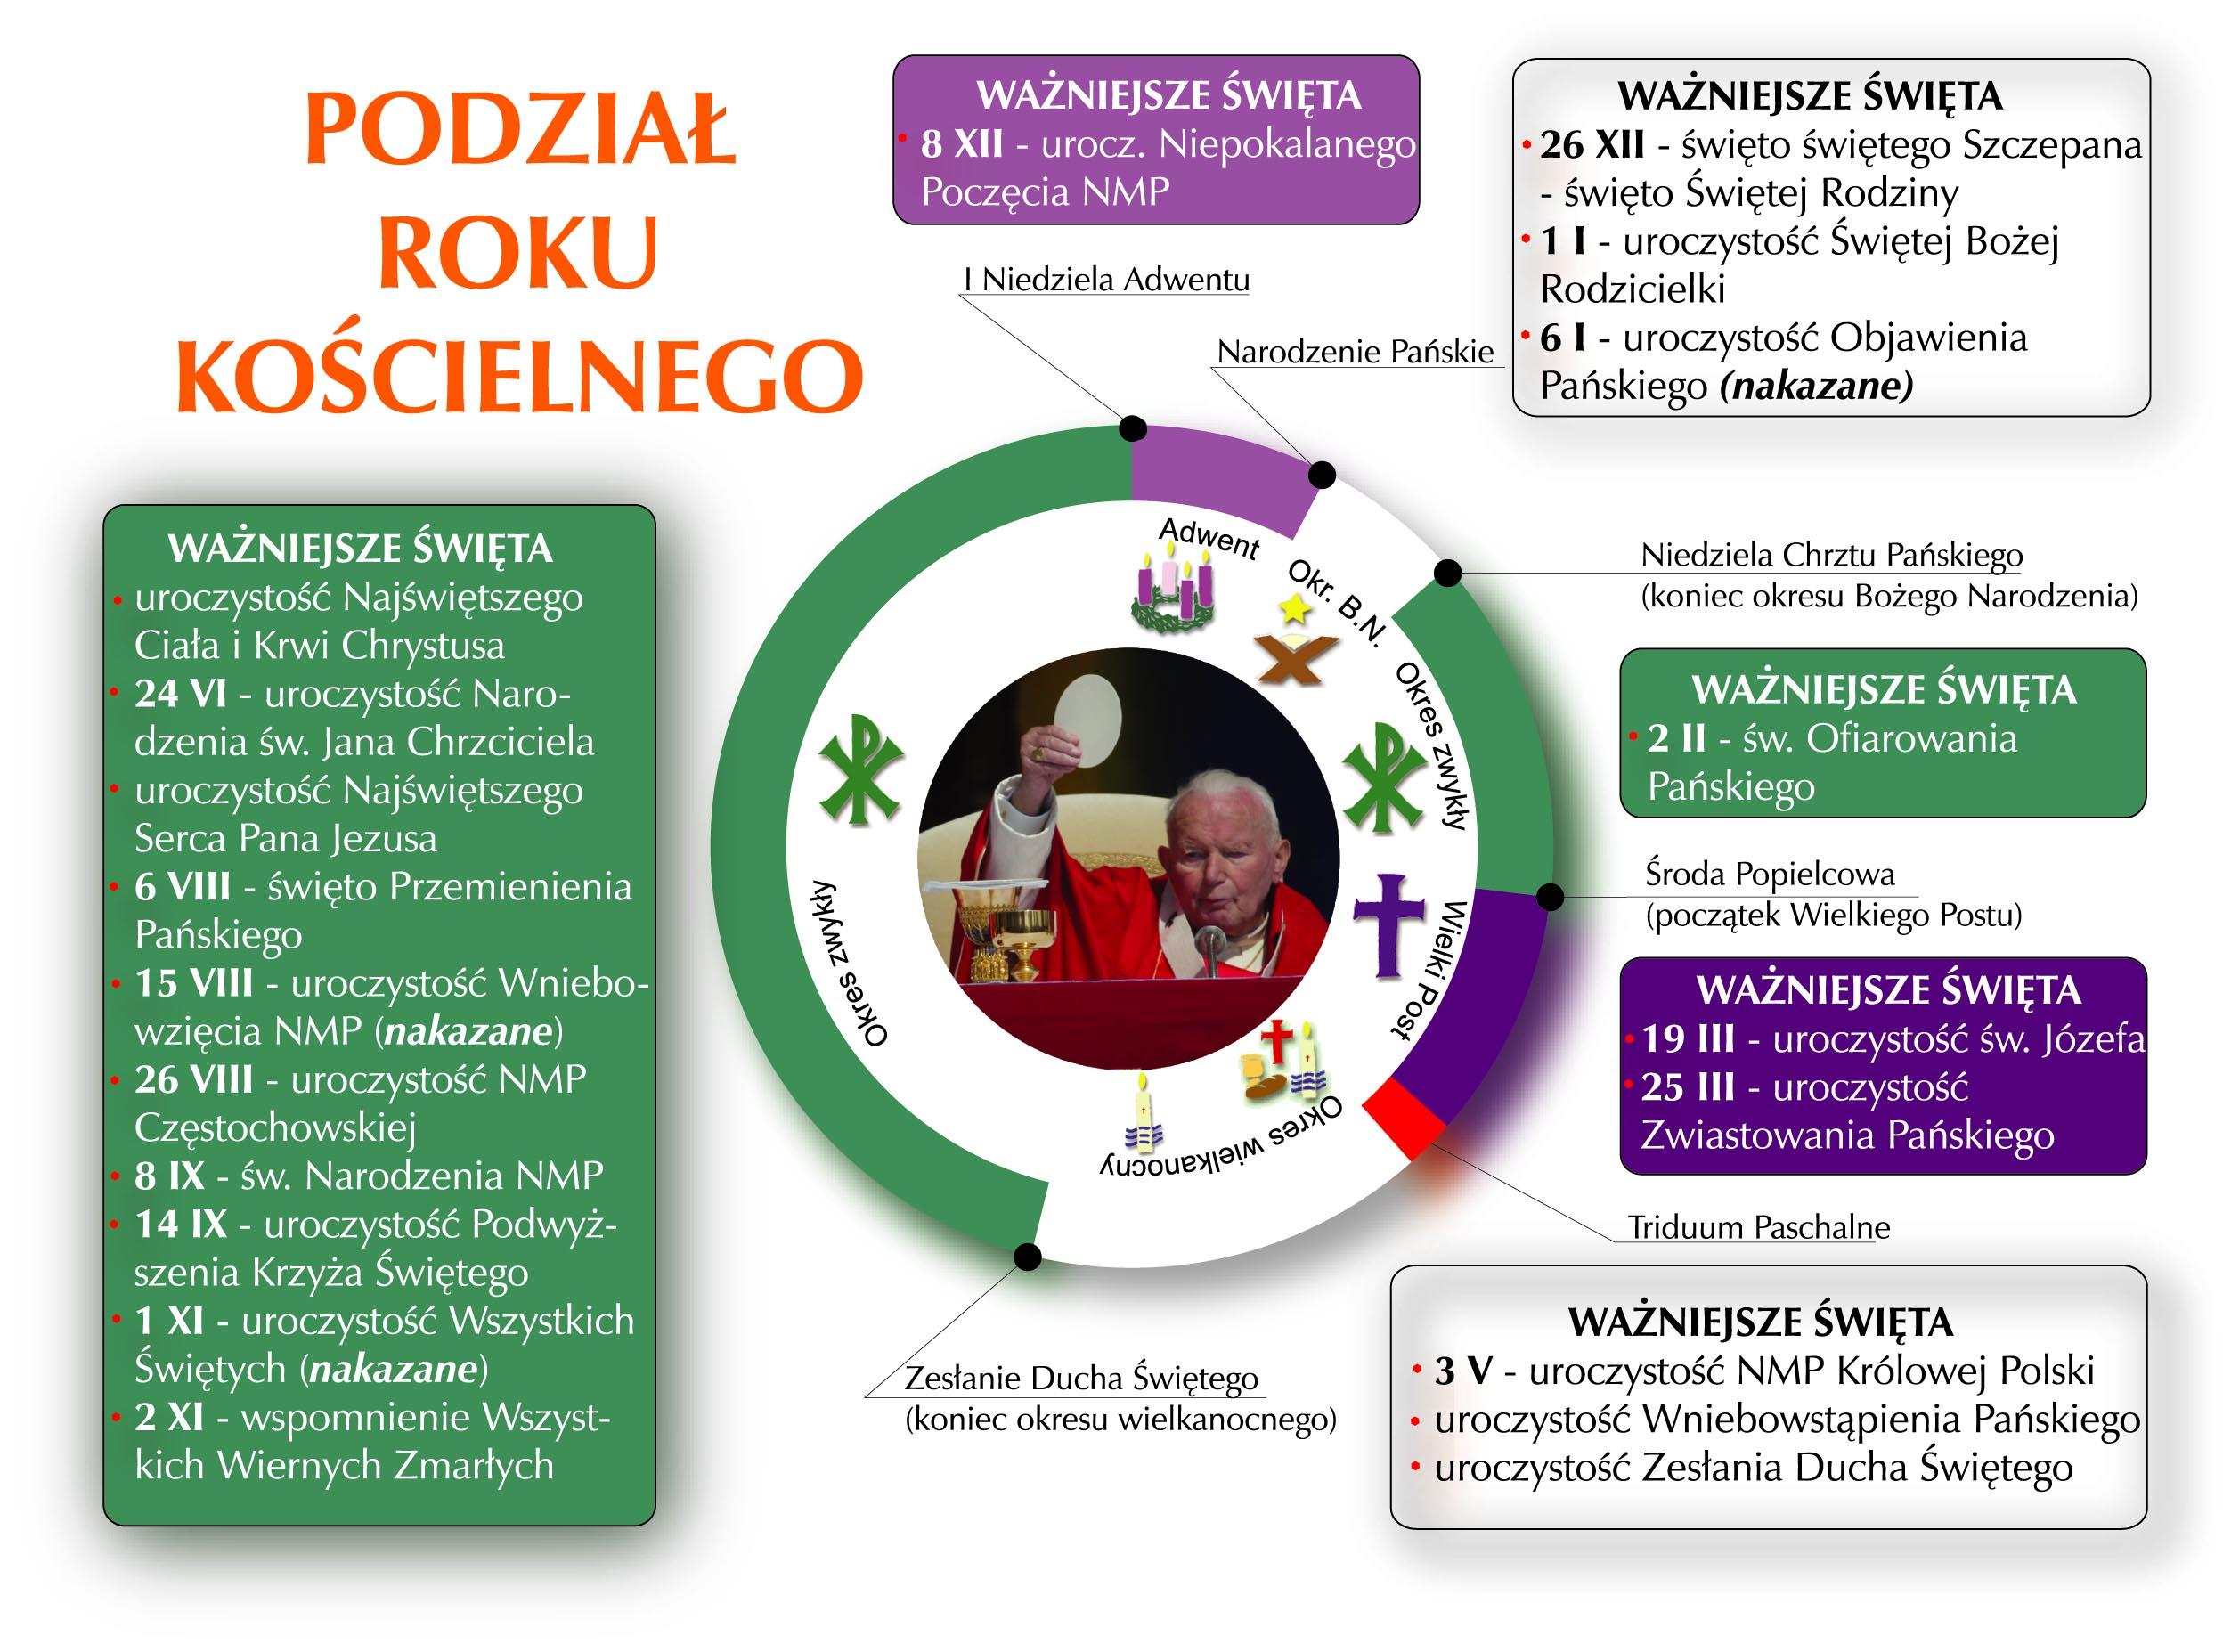 https://liturgia.wiara.pl/files_upload/old/liturgia.wiara.pl/elementy/rok_liturgiczny.jpg